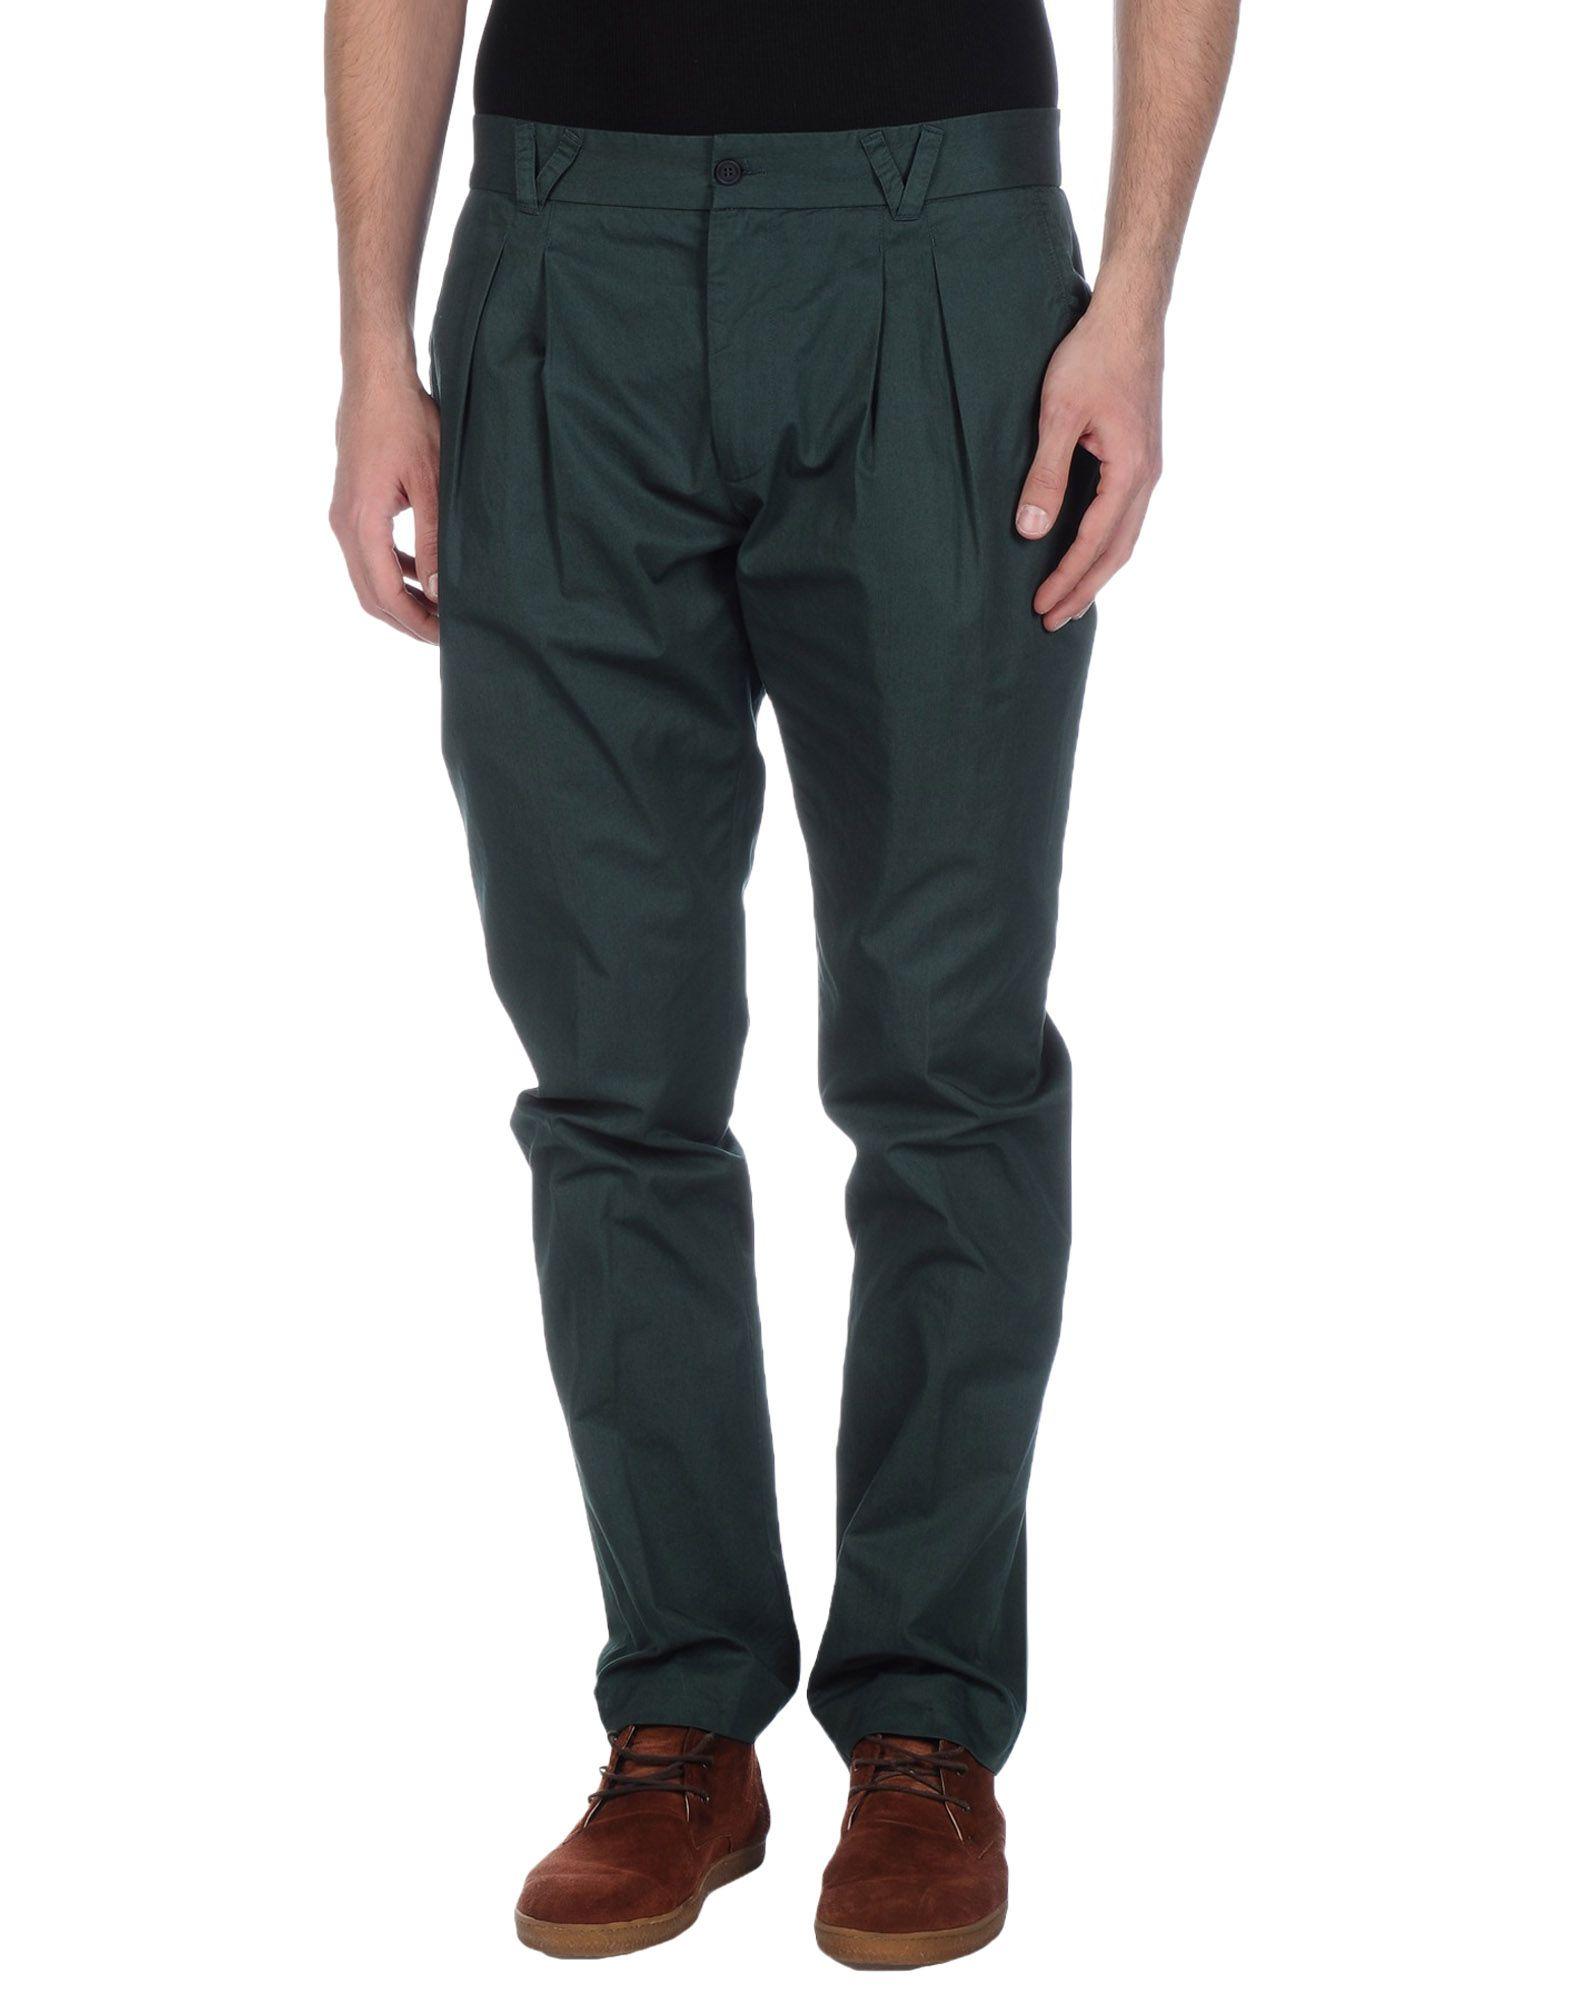 Повседневные брюки D&g  G/36635782KI цена 2016